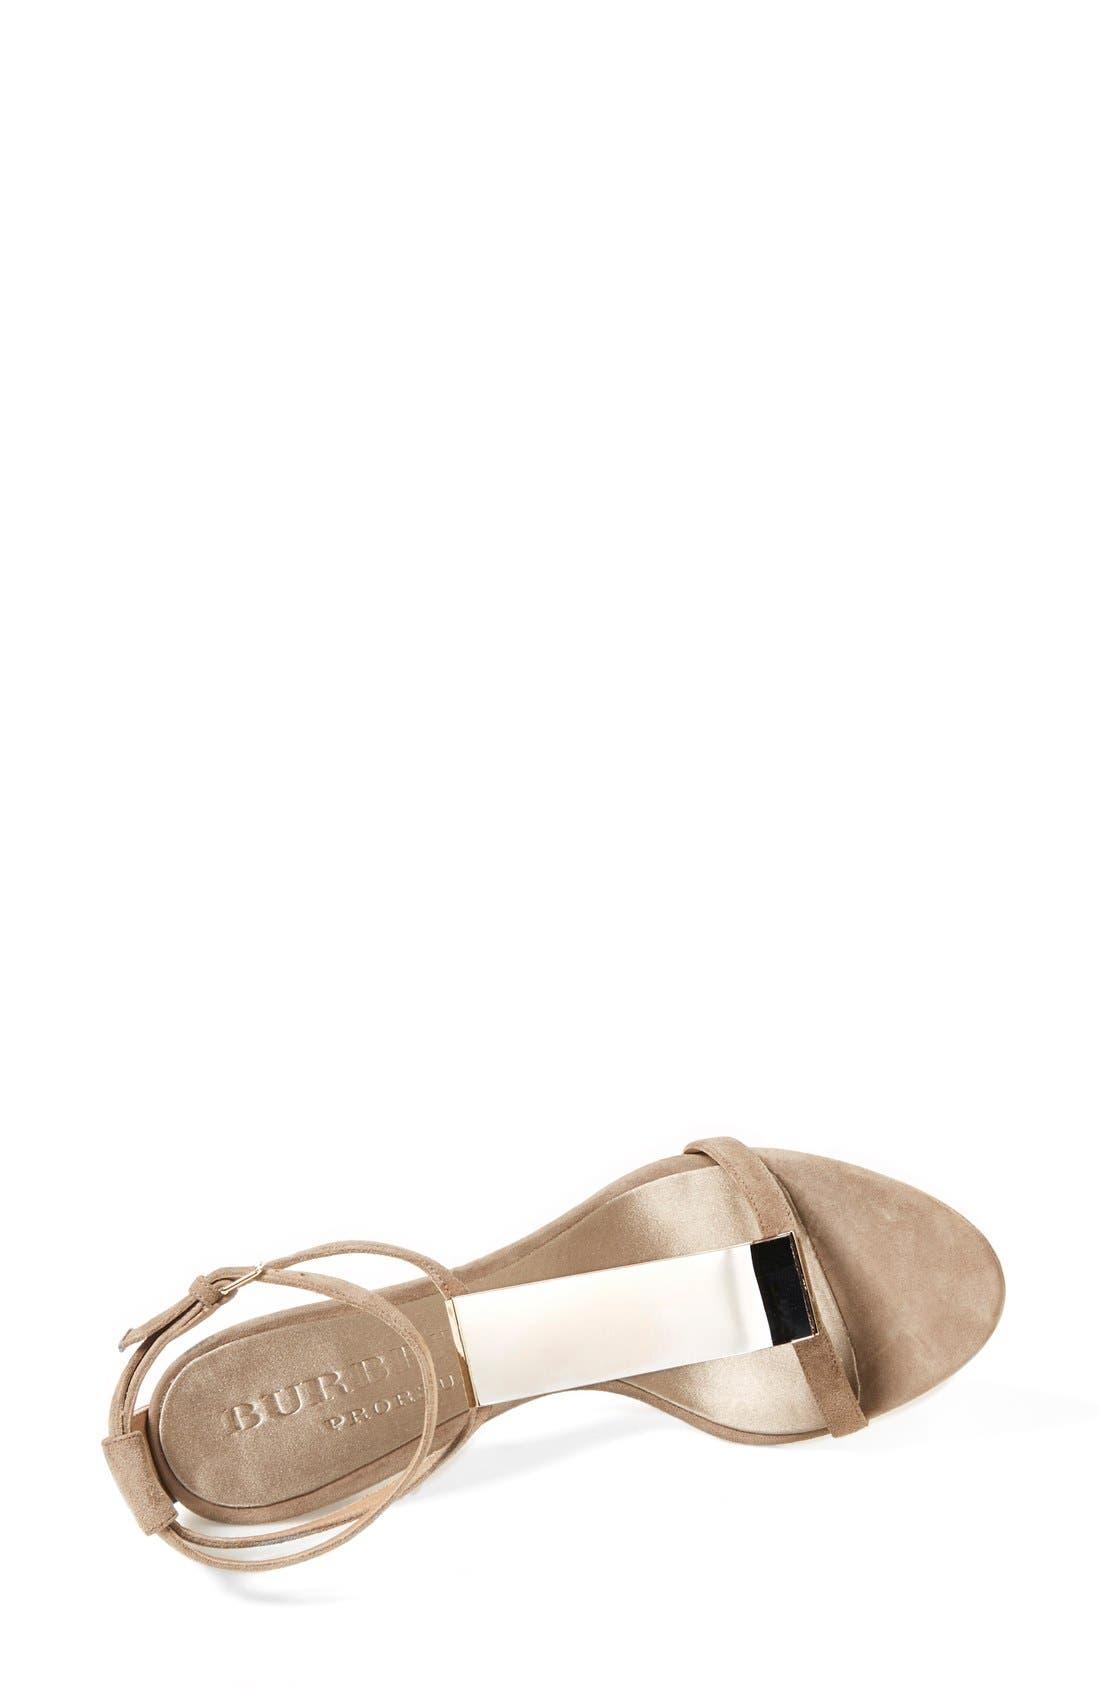 Alternate Image 3  - Burberry 'Irving' Perspex® T-Bar Sandal (Women)